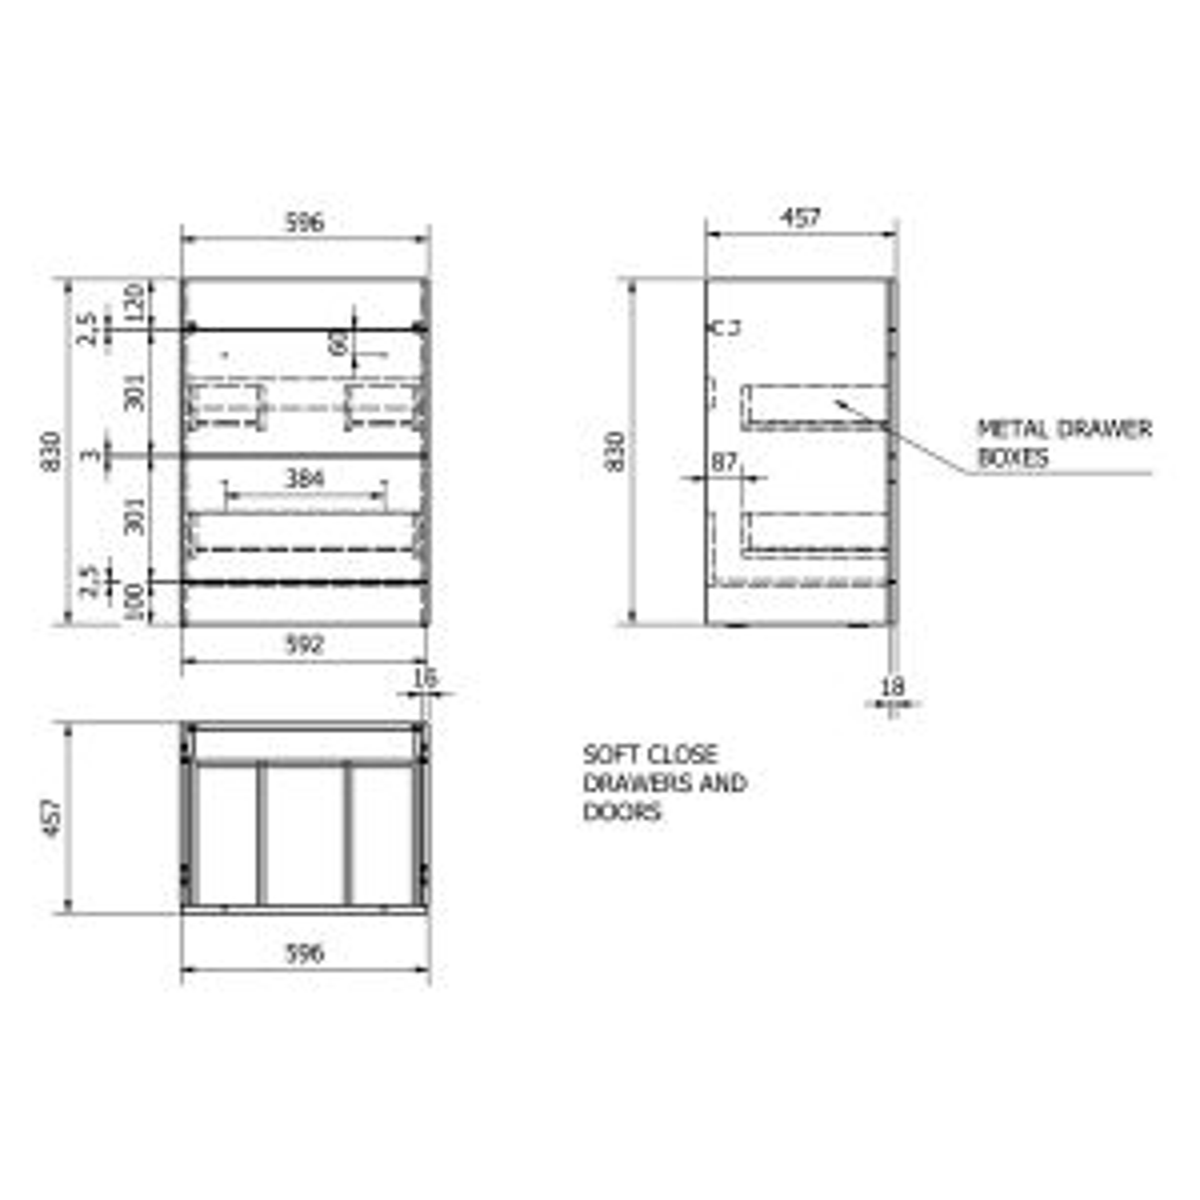 Kartell Purity Grey Ash 2 Drawer Floor Standing Vanity Unit 600mm Drawing